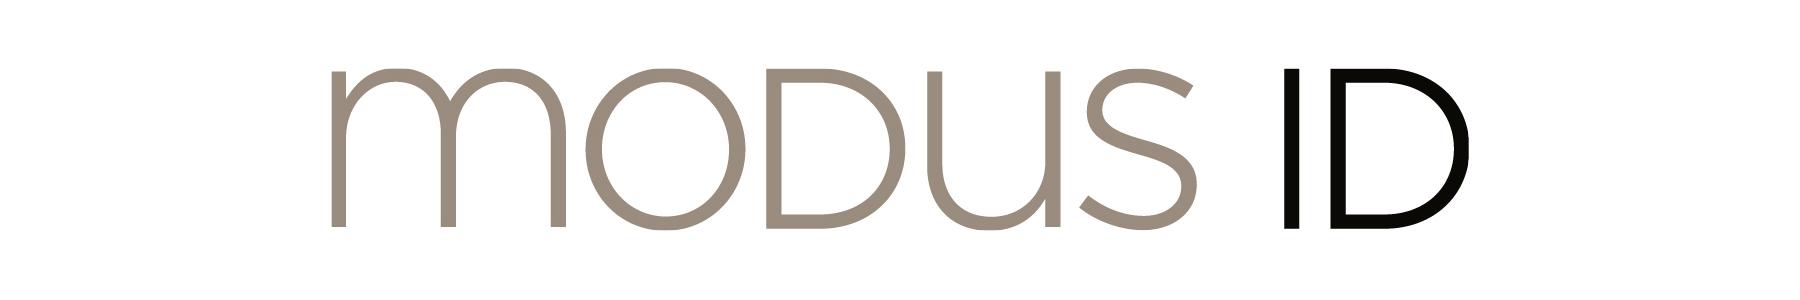 Modus ID Website Logo WHITE SPACE.jpg